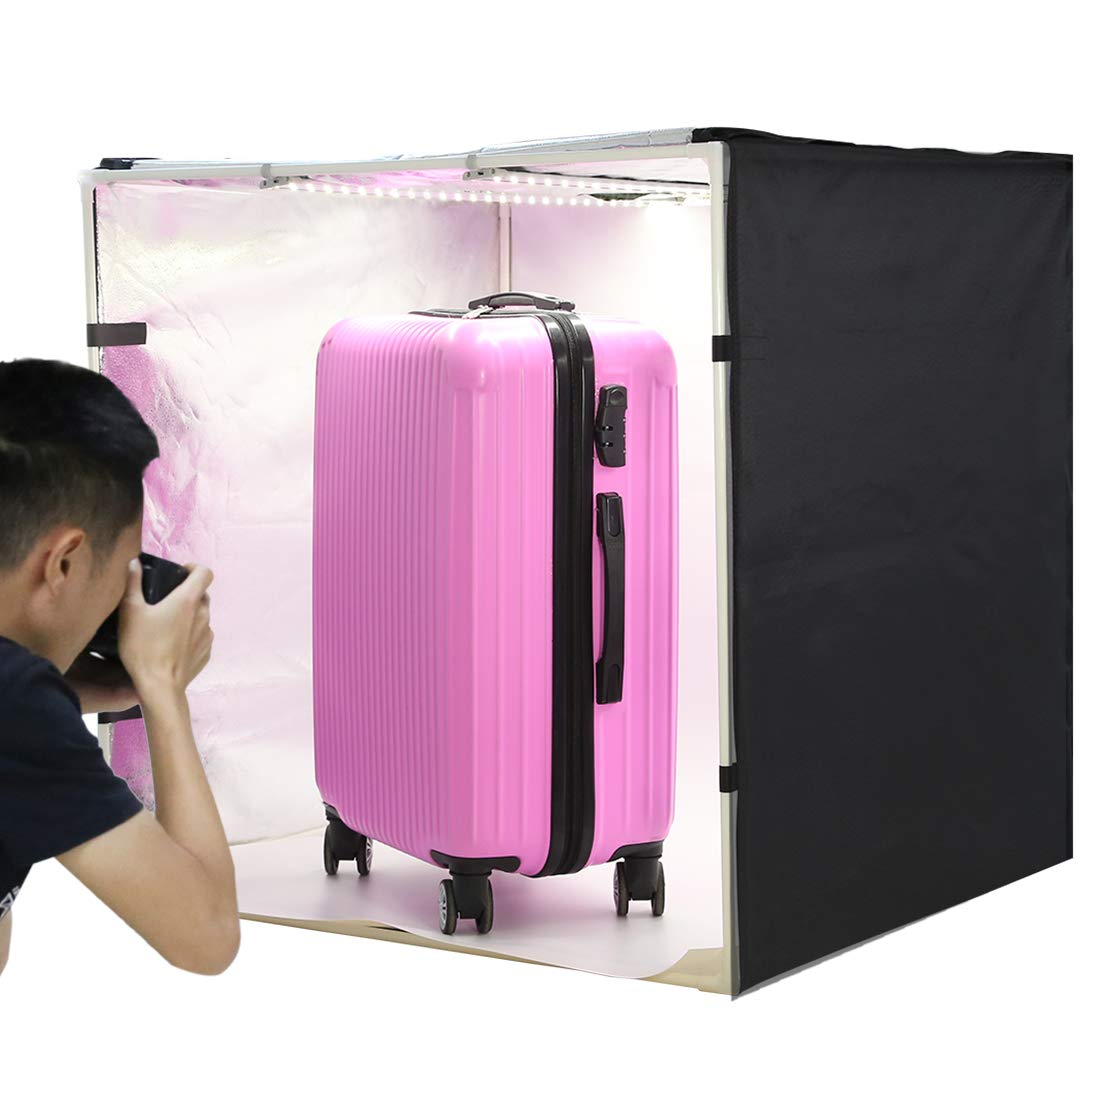 PULUZ Photo Studio Light Box 31.5'' X 31.5'' X 31.5'' / 80 X 80 X 80 cm LED 5500LM Mini Portable Photo Studio Shooting Tent with 3 Backgrounds White Black Orange 80W by PULUZ